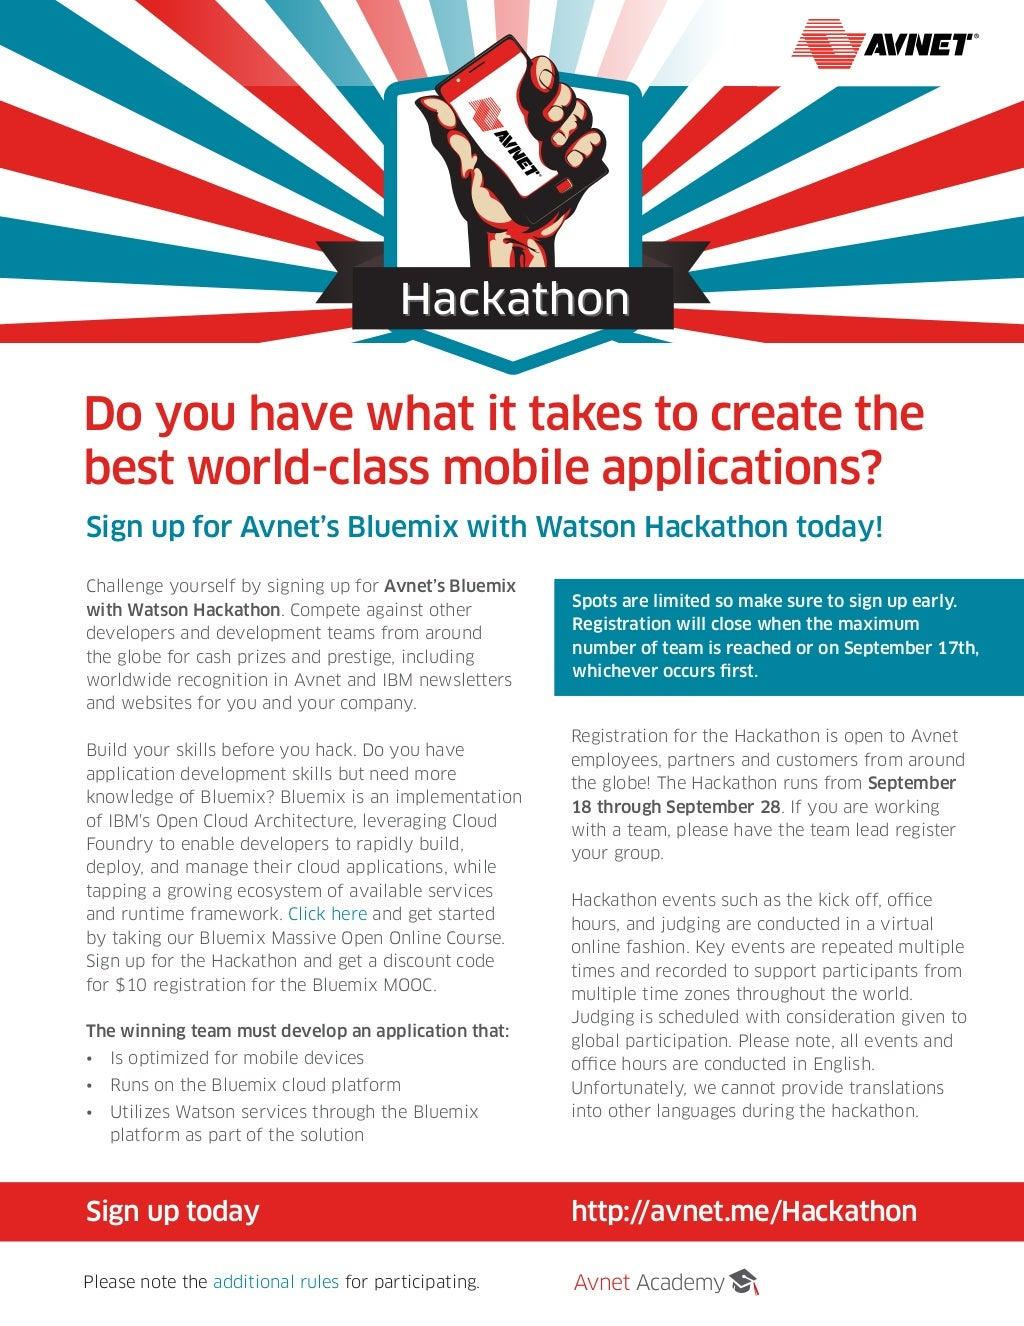 Avnet Academy Hackathon with IBM Bluemix & Watson